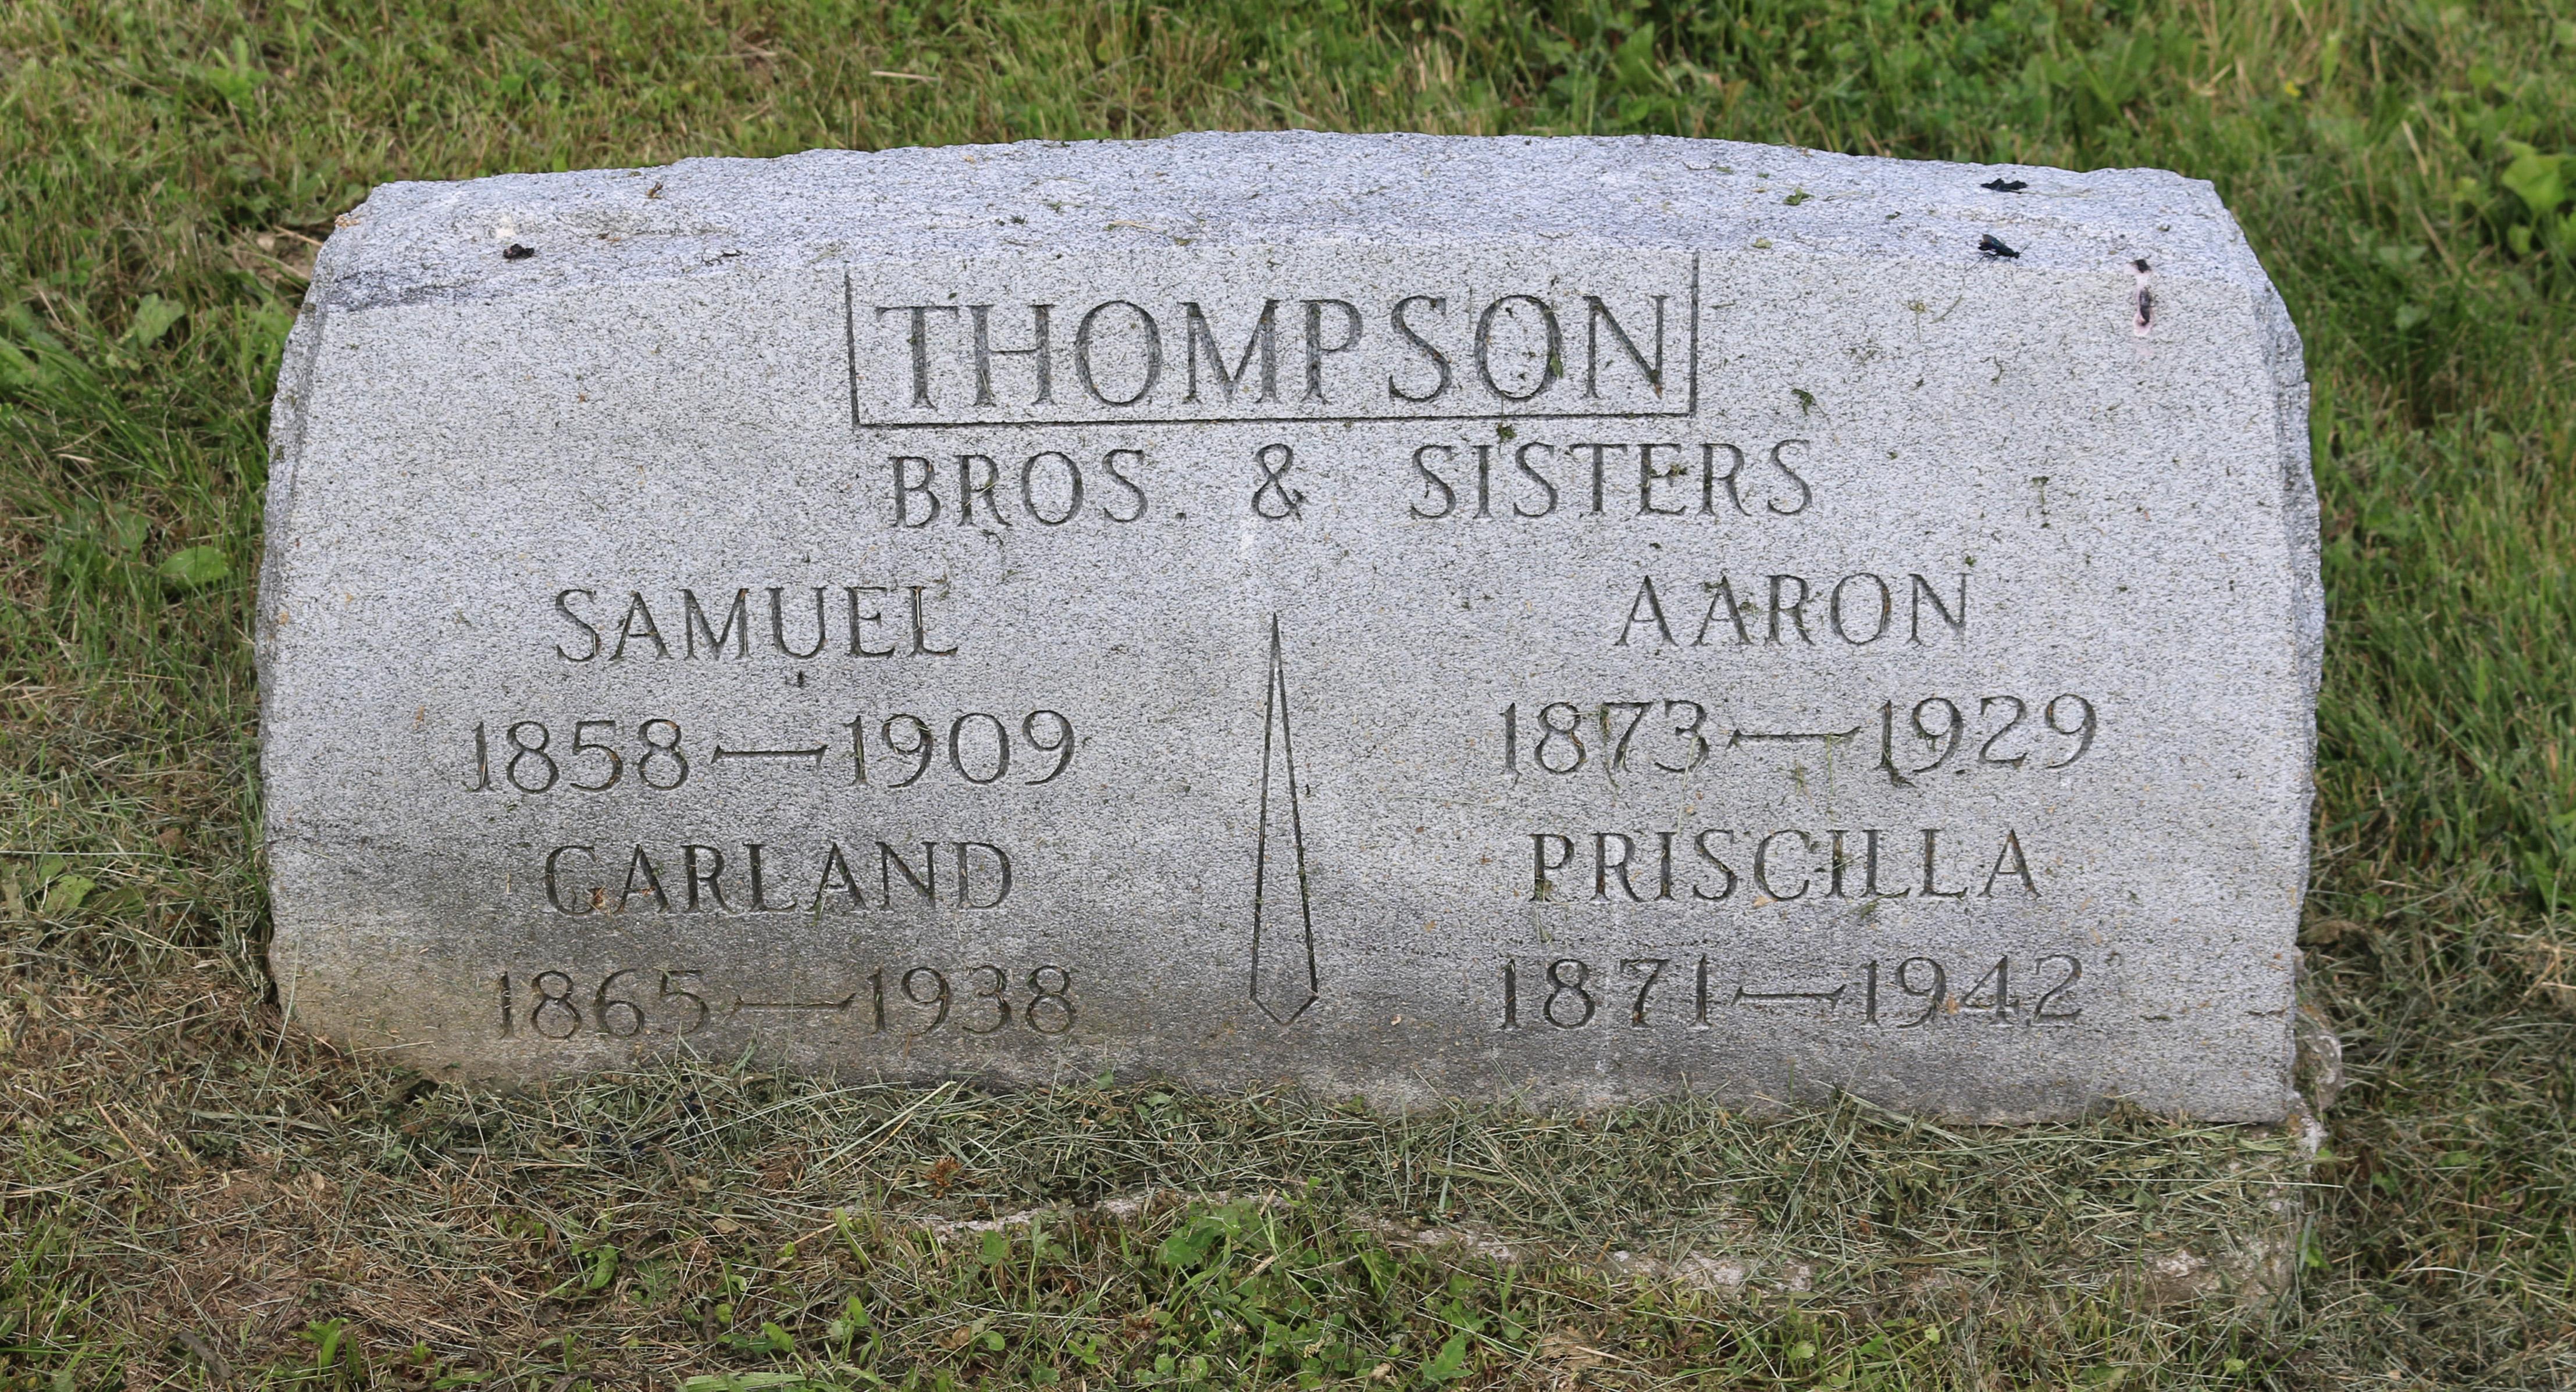 Priscilla Ann Thompson's gravestone